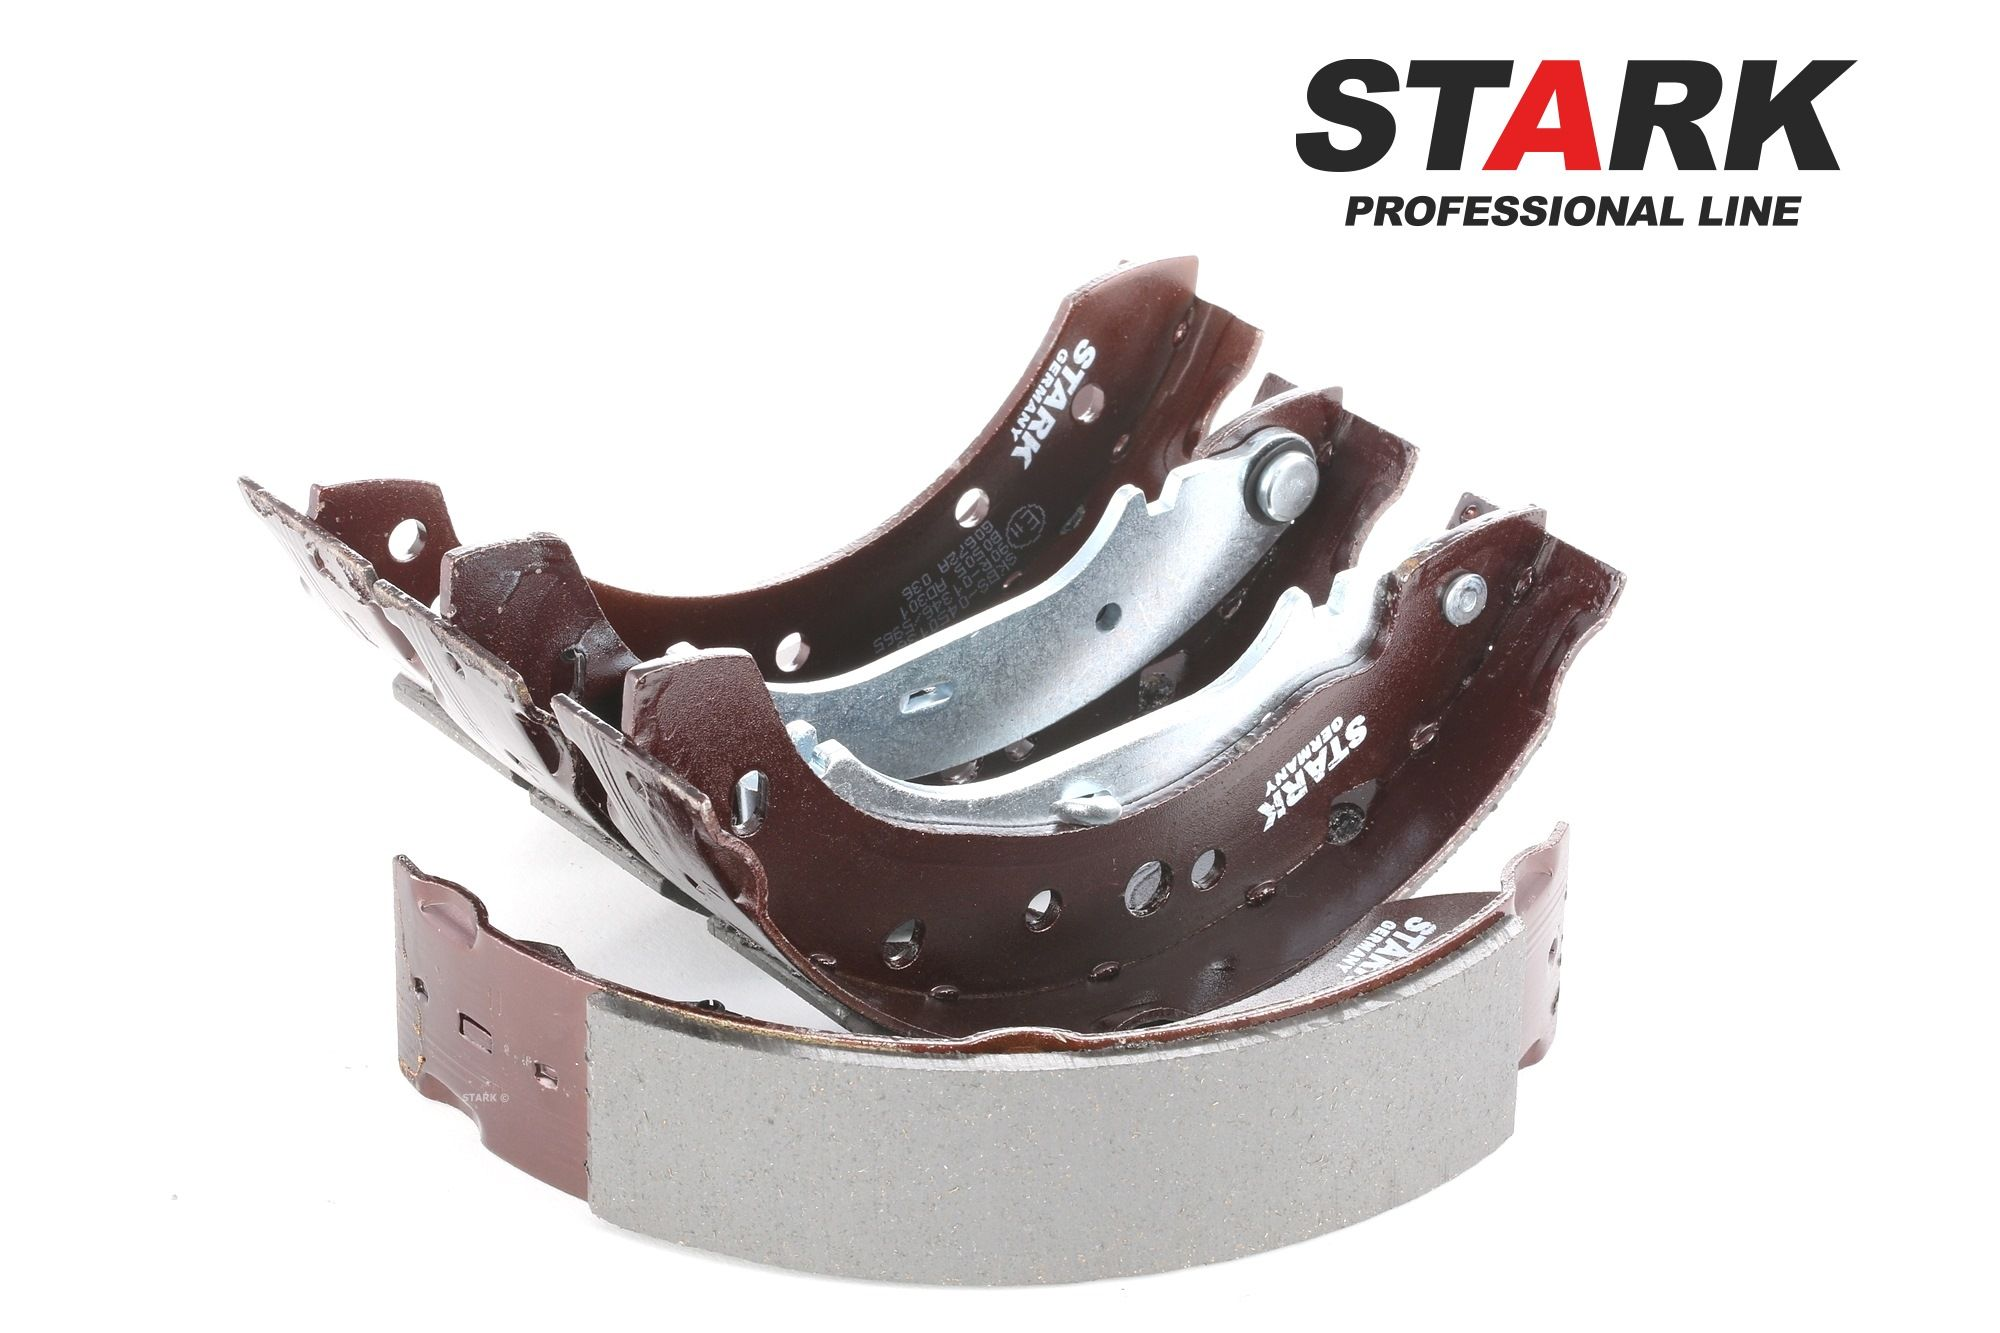 STARK Bremsbackensatz SKBS-0450136